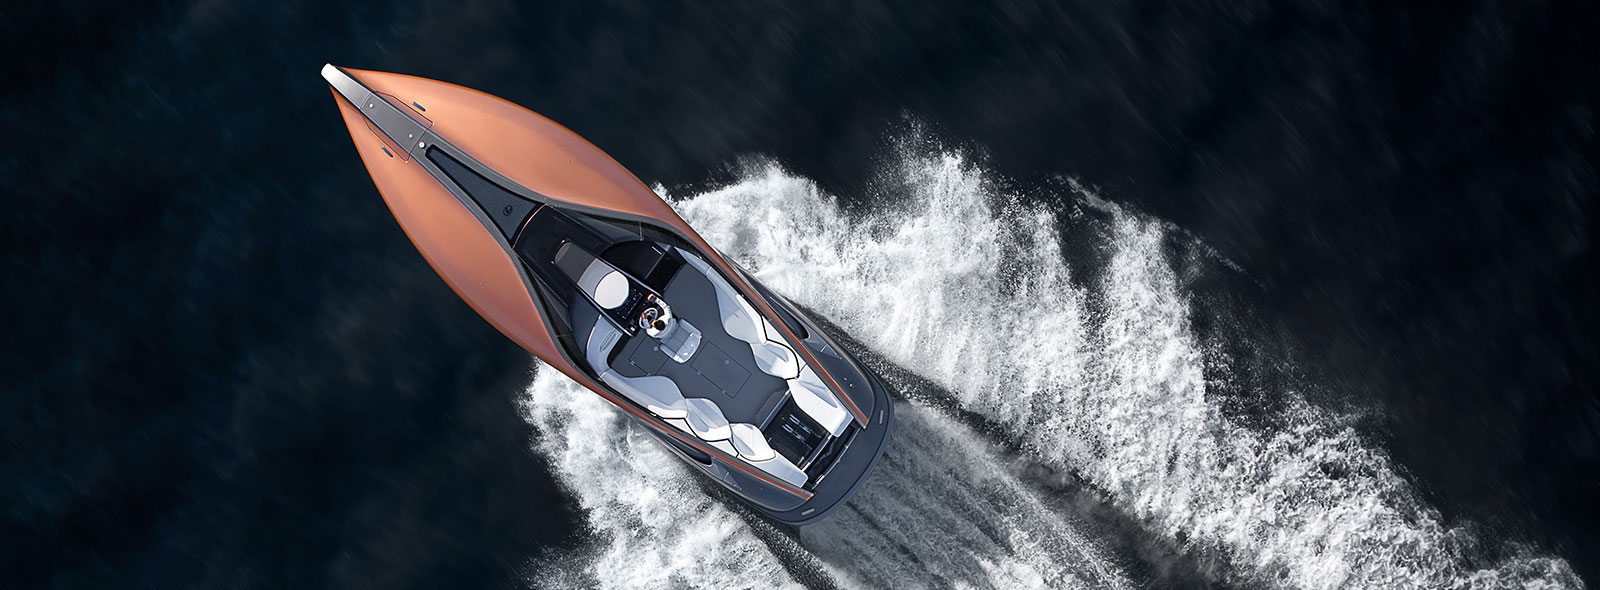 2017 Lexus Sports Yacht Concept Gallery 01